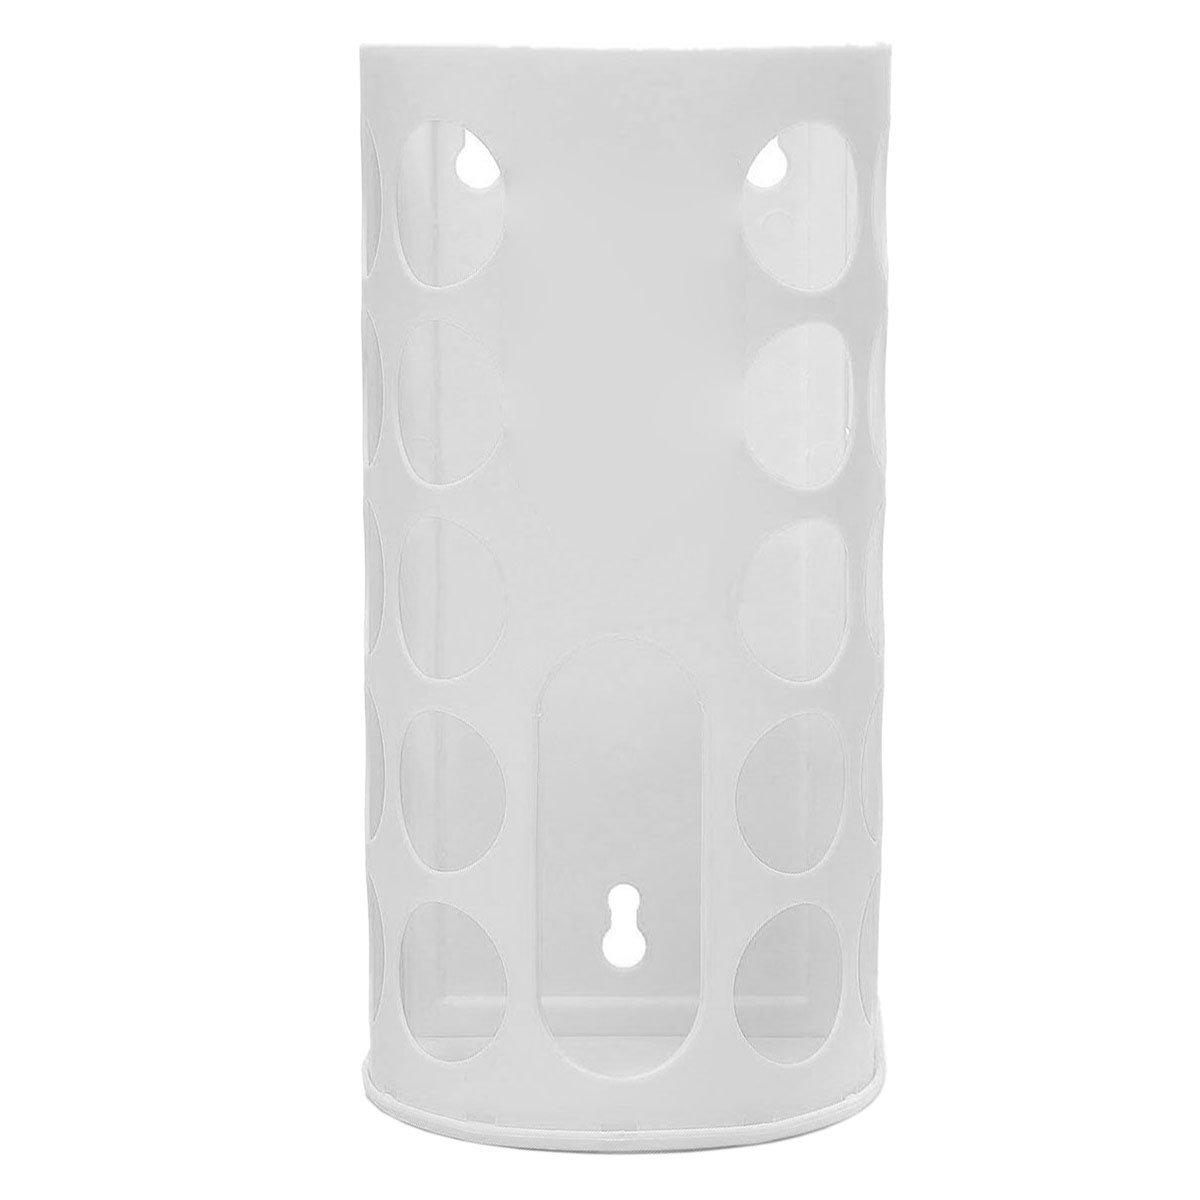 Soporte de bolsa de almacenamiento - TOOGOO(R)bolsas de plastico de almacenamiento de compras para vida elegante estante de titular de almacenamiento ...